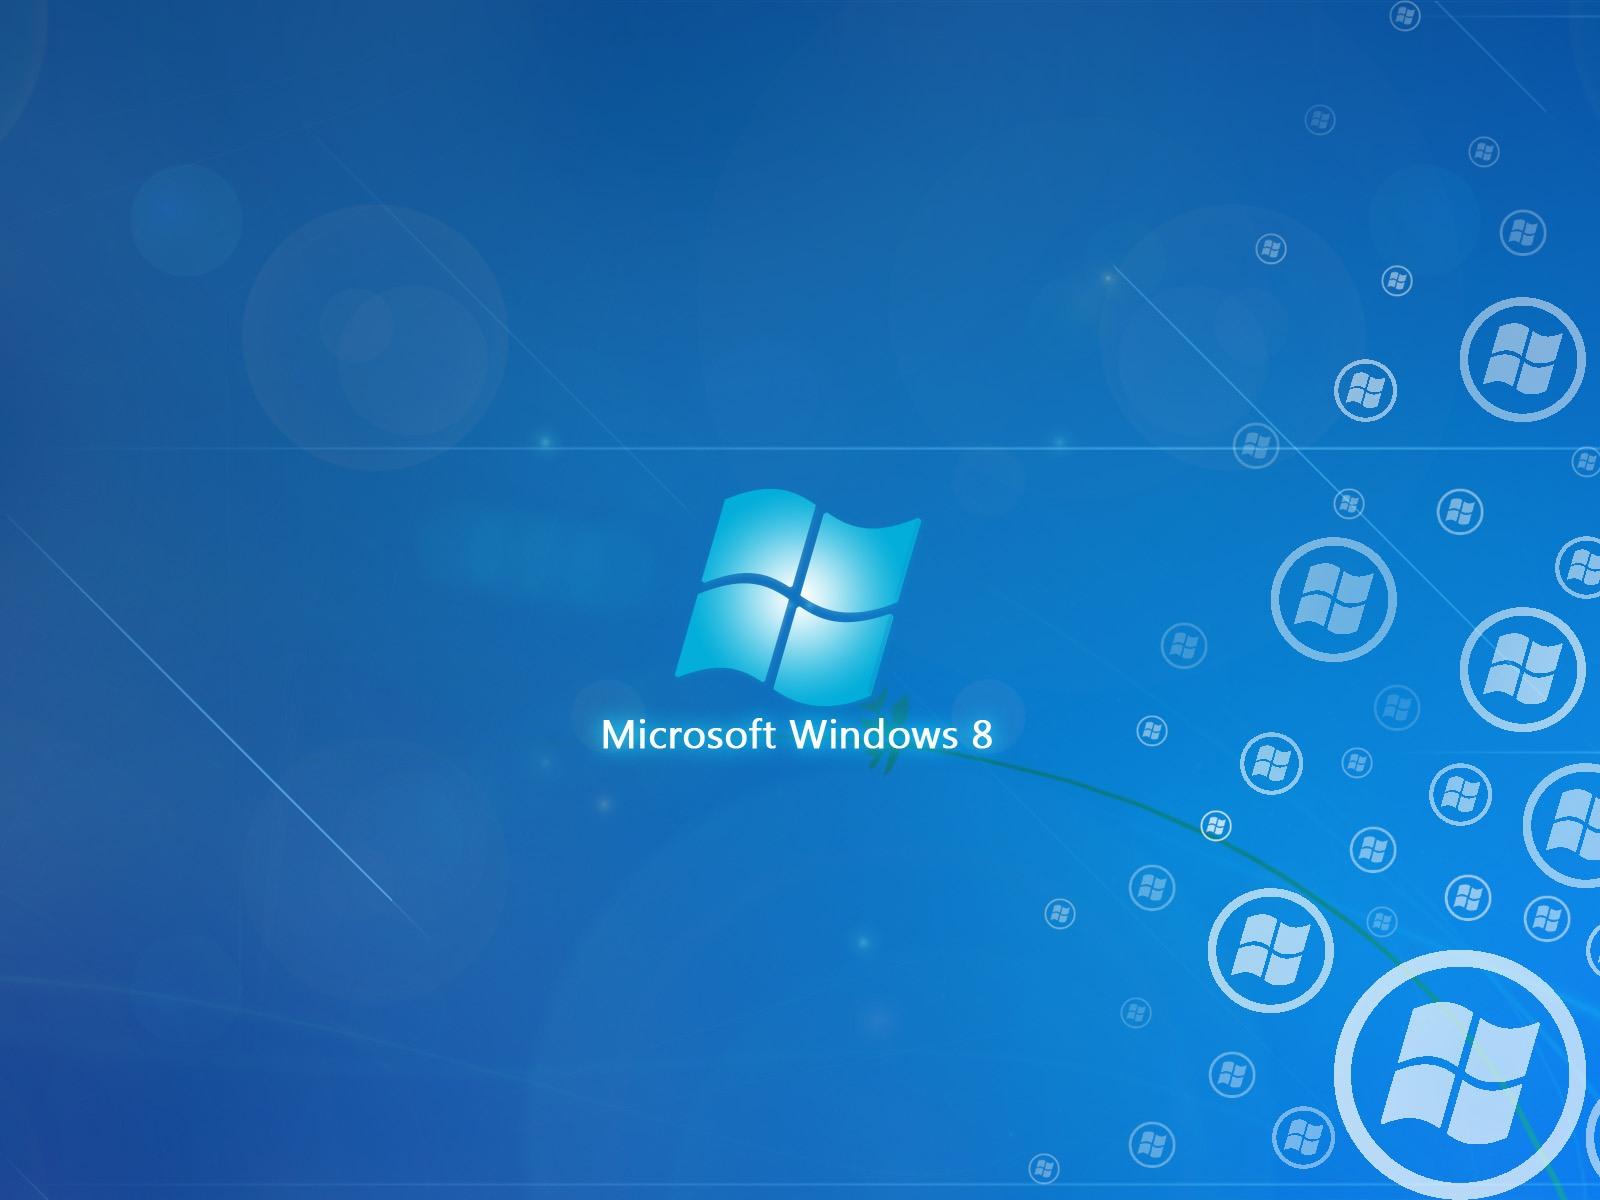 Windows 8 主题壁纸 18Windows 8 主题壁纸 系统图片